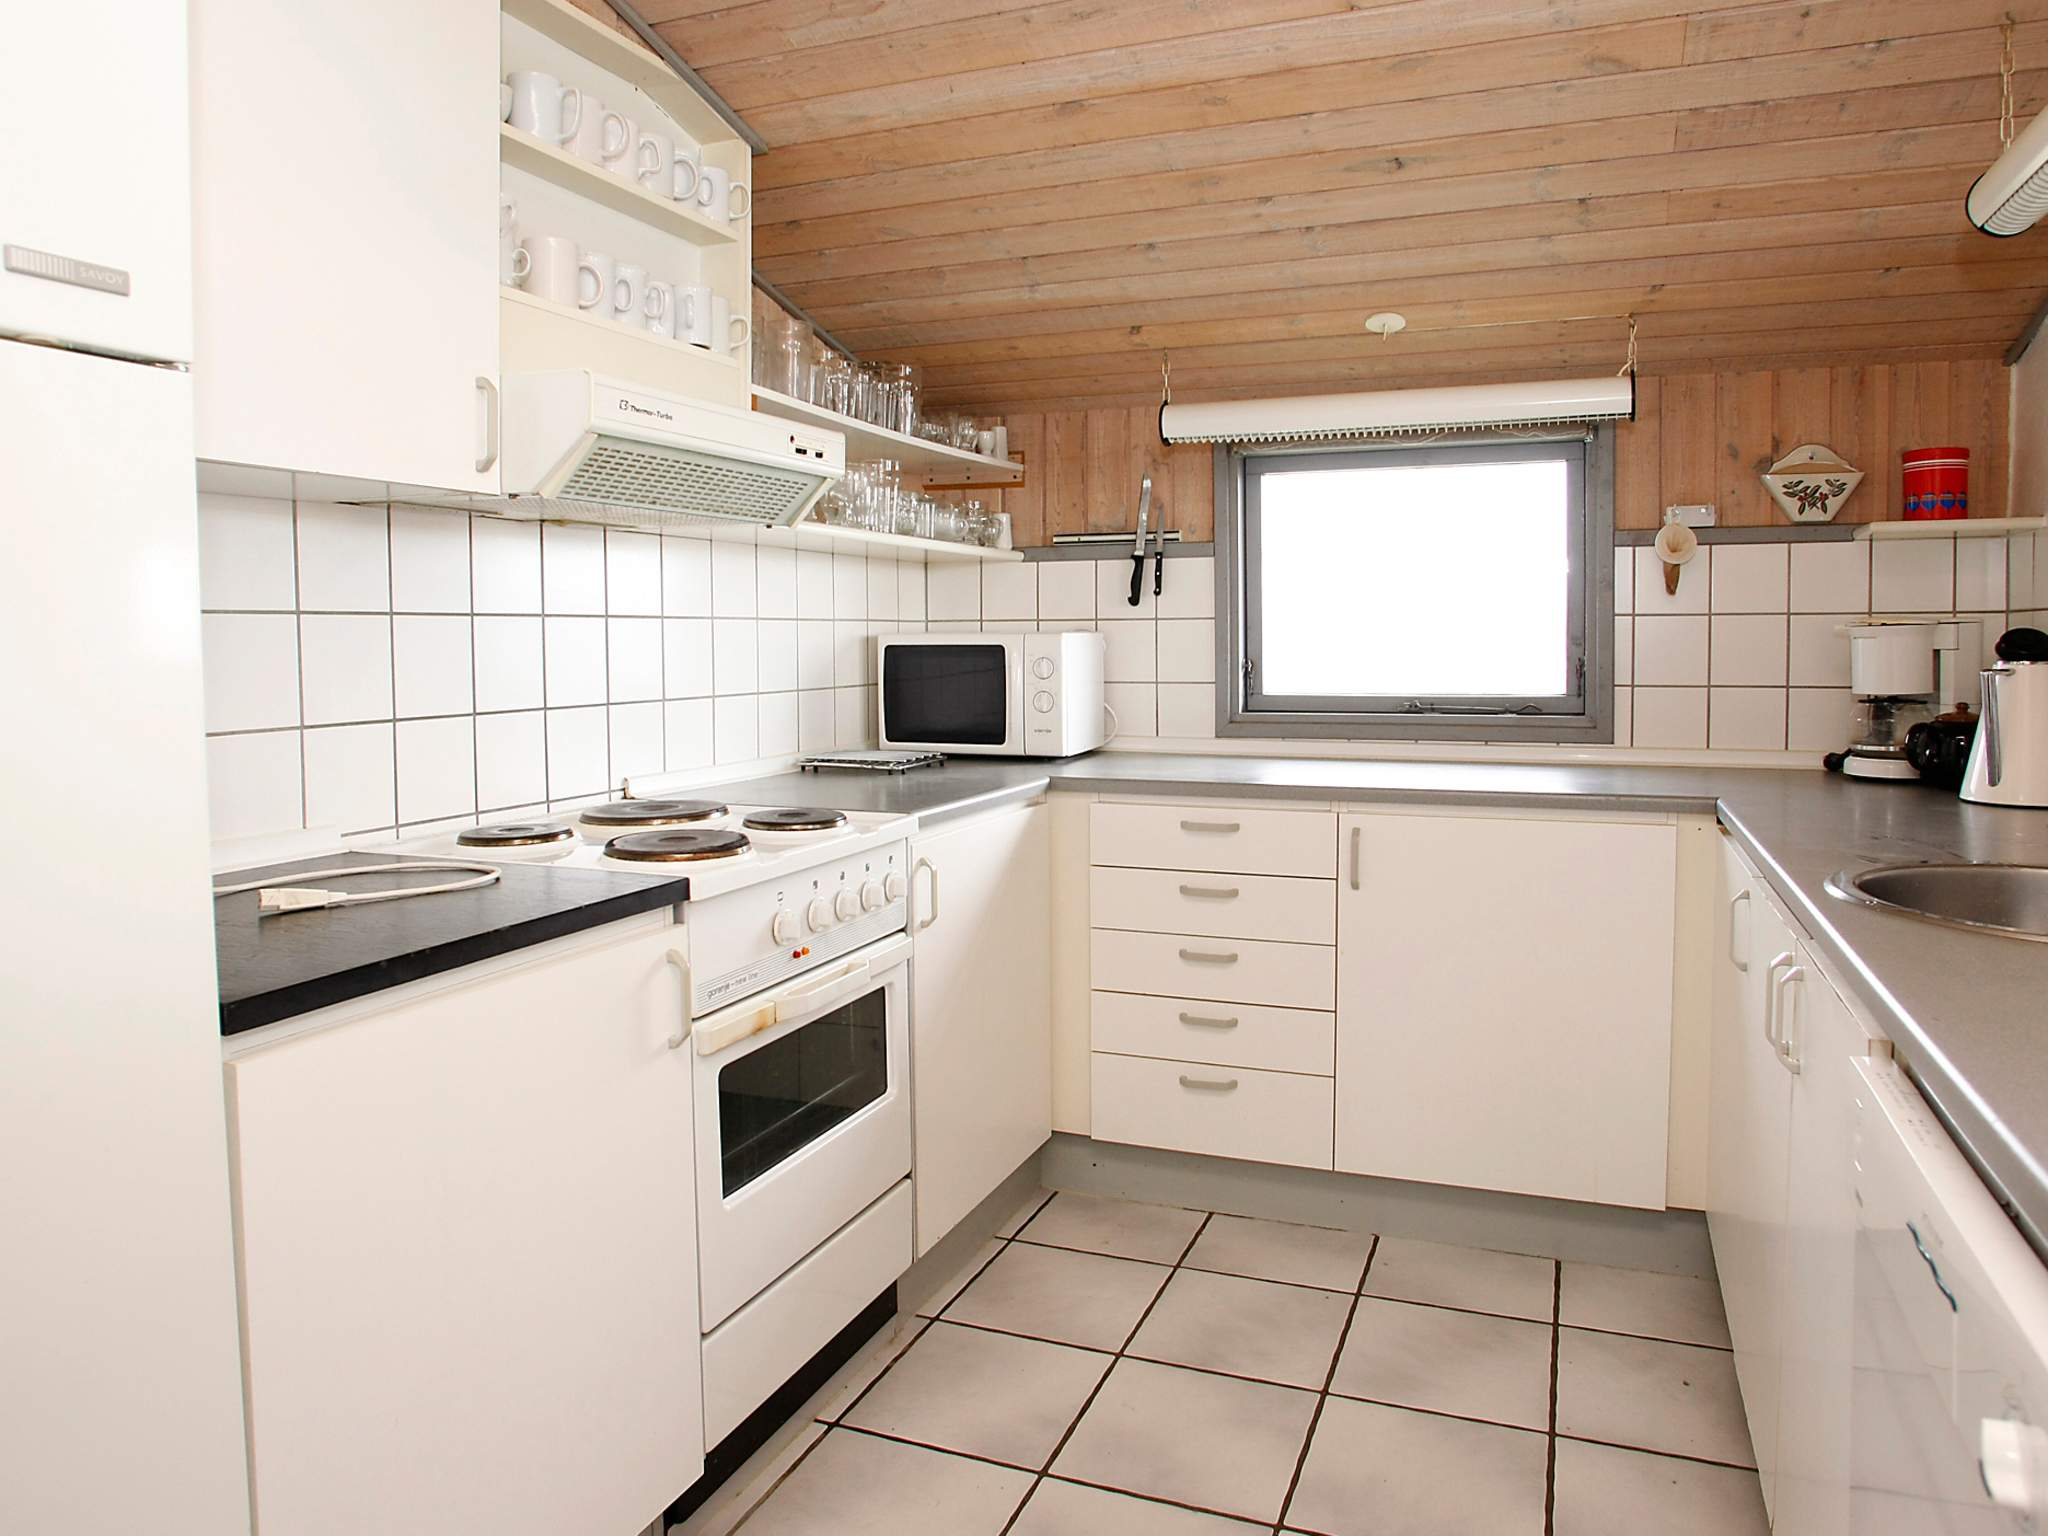 Ferienhaus Nr. Lyngby (335282), Løkken, , Nordwestjütland, Dänemark, Bild 4